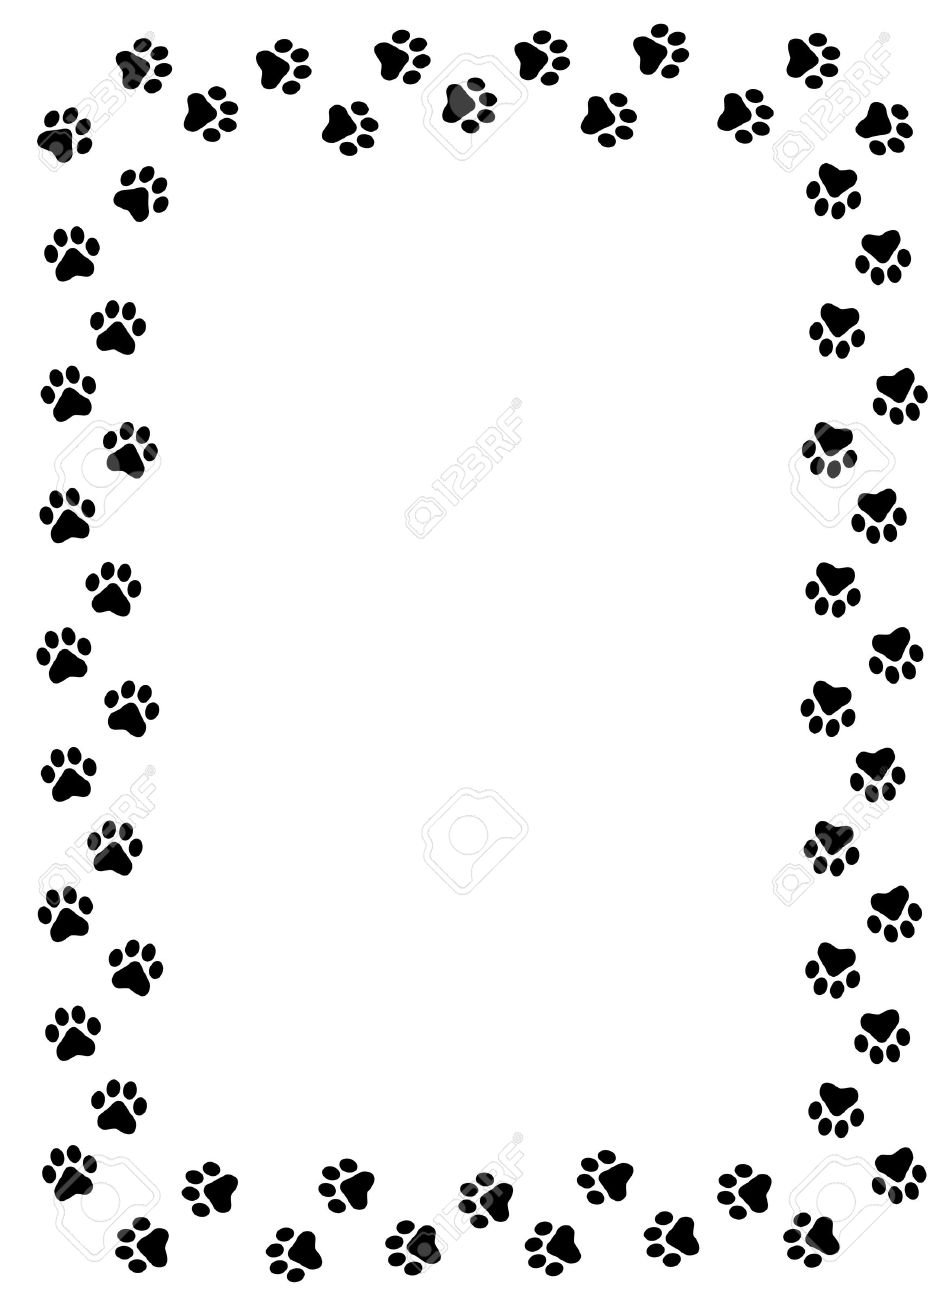 dog paw prints border on white background royalty free cliparts rh 123rf com dog paw print vector art free dog paw print vector free download